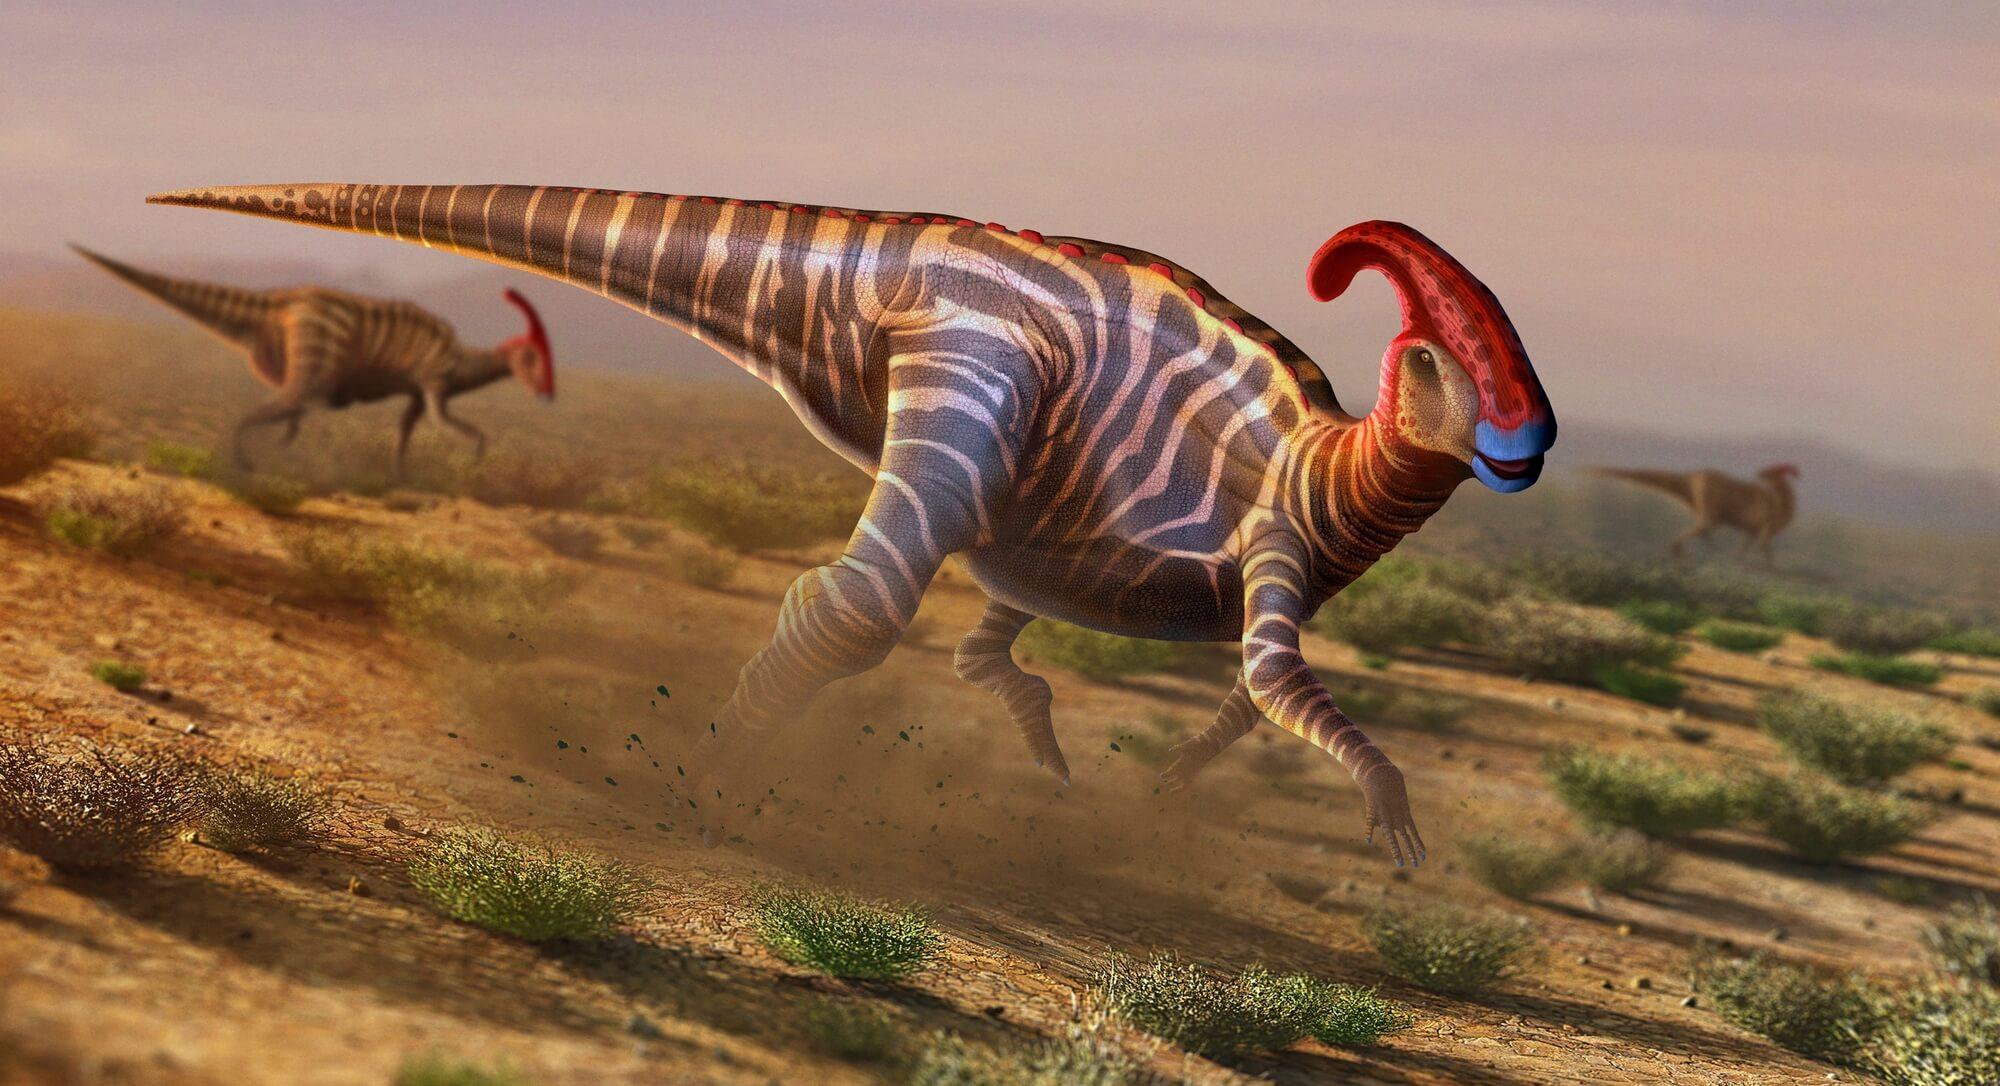 Parasaurolophus wall mural parasaurolophus wallpaper wallsauce parasaurolophus wall mural photo wallpaper amipublicfo Image collections